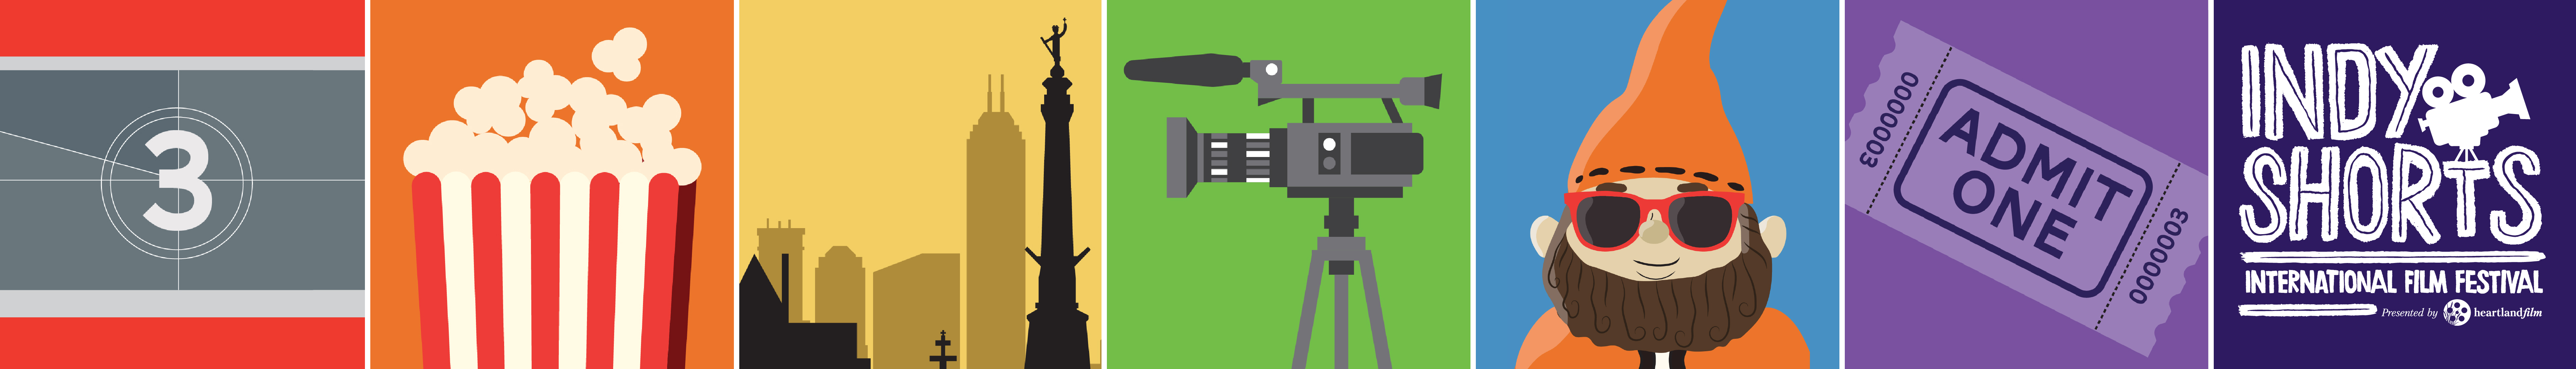 Indy Shorts Film Festival 2020